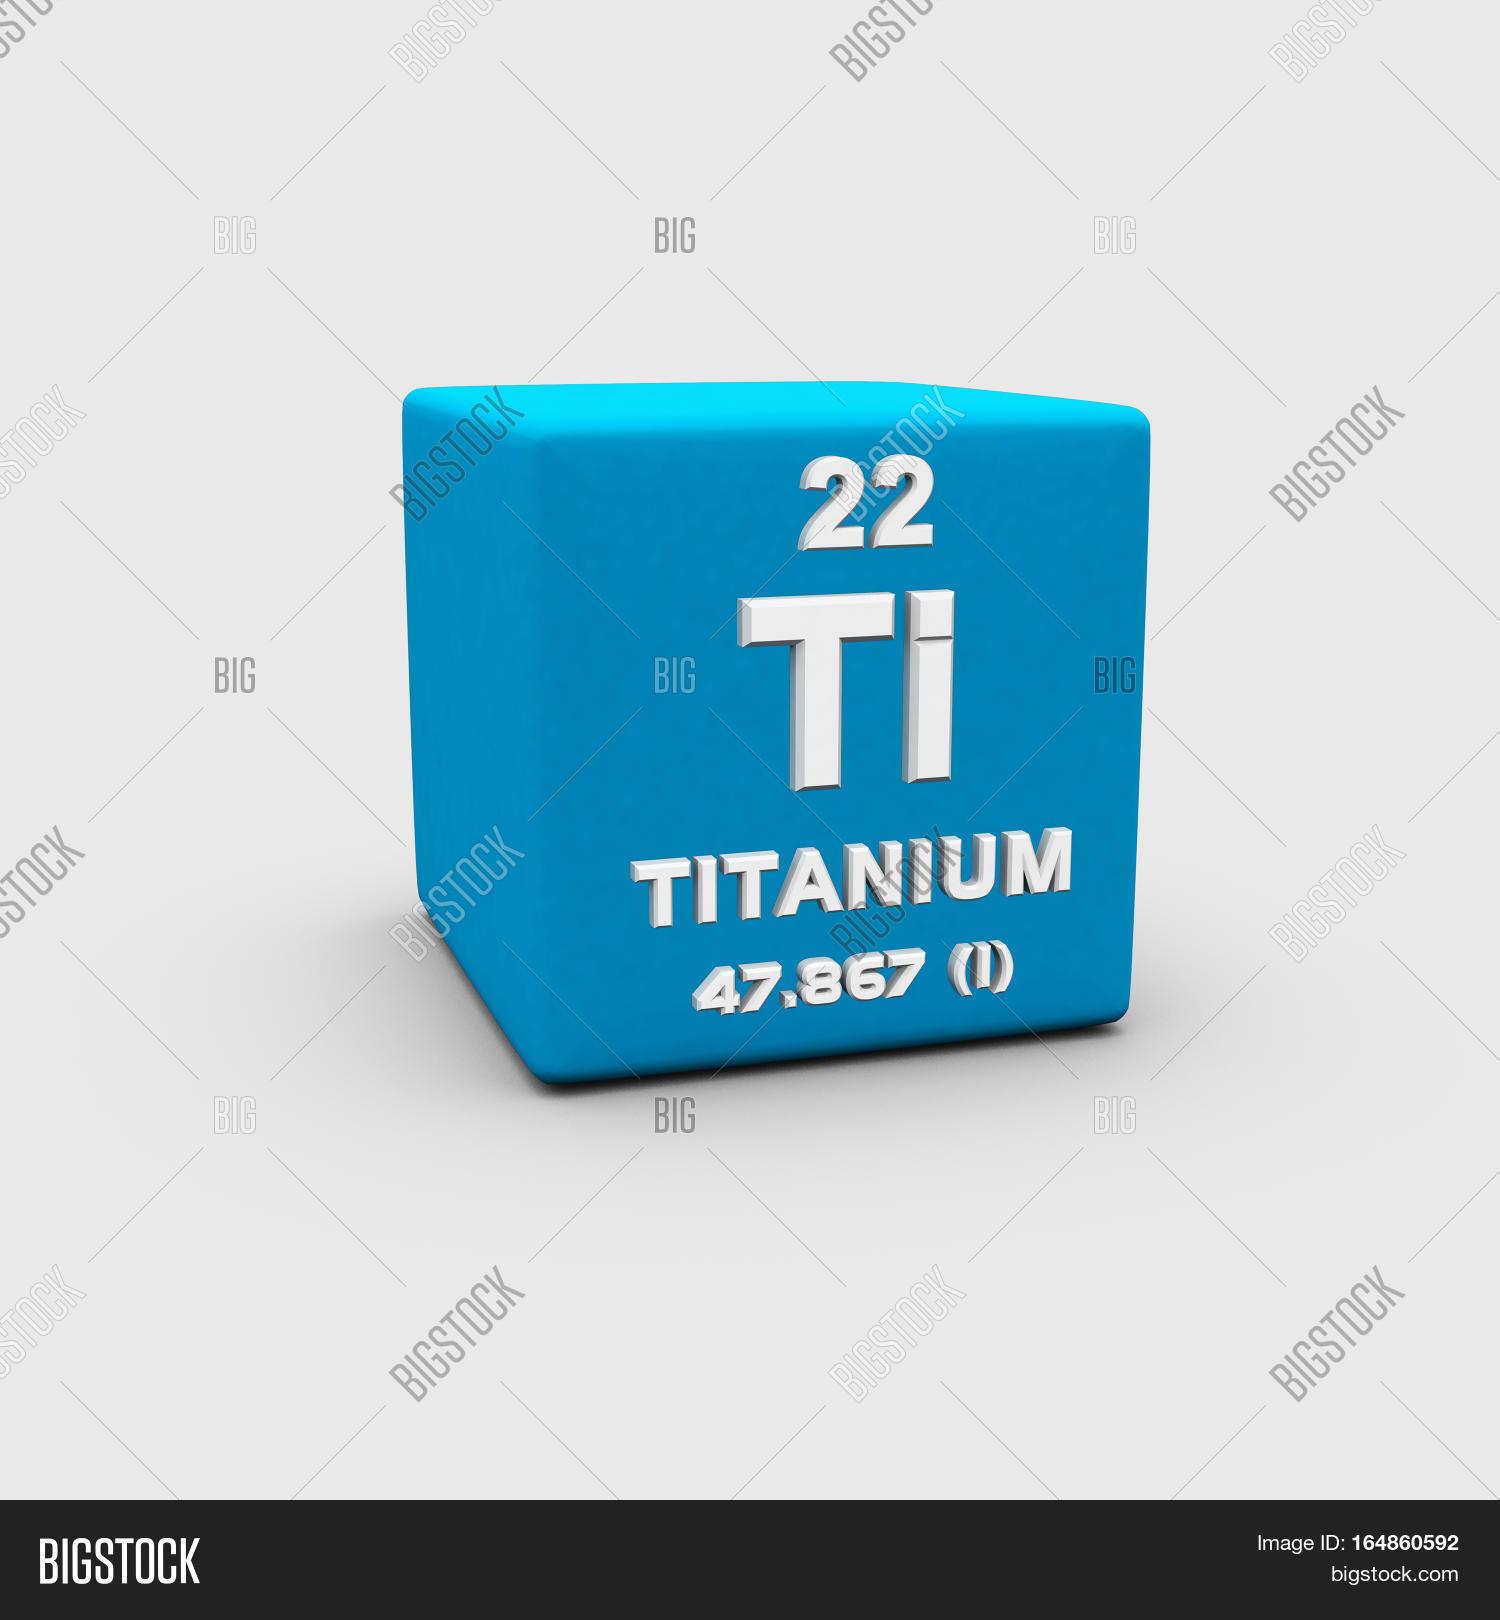 Titanium Chemical Image Photo Free Trial Bigstock